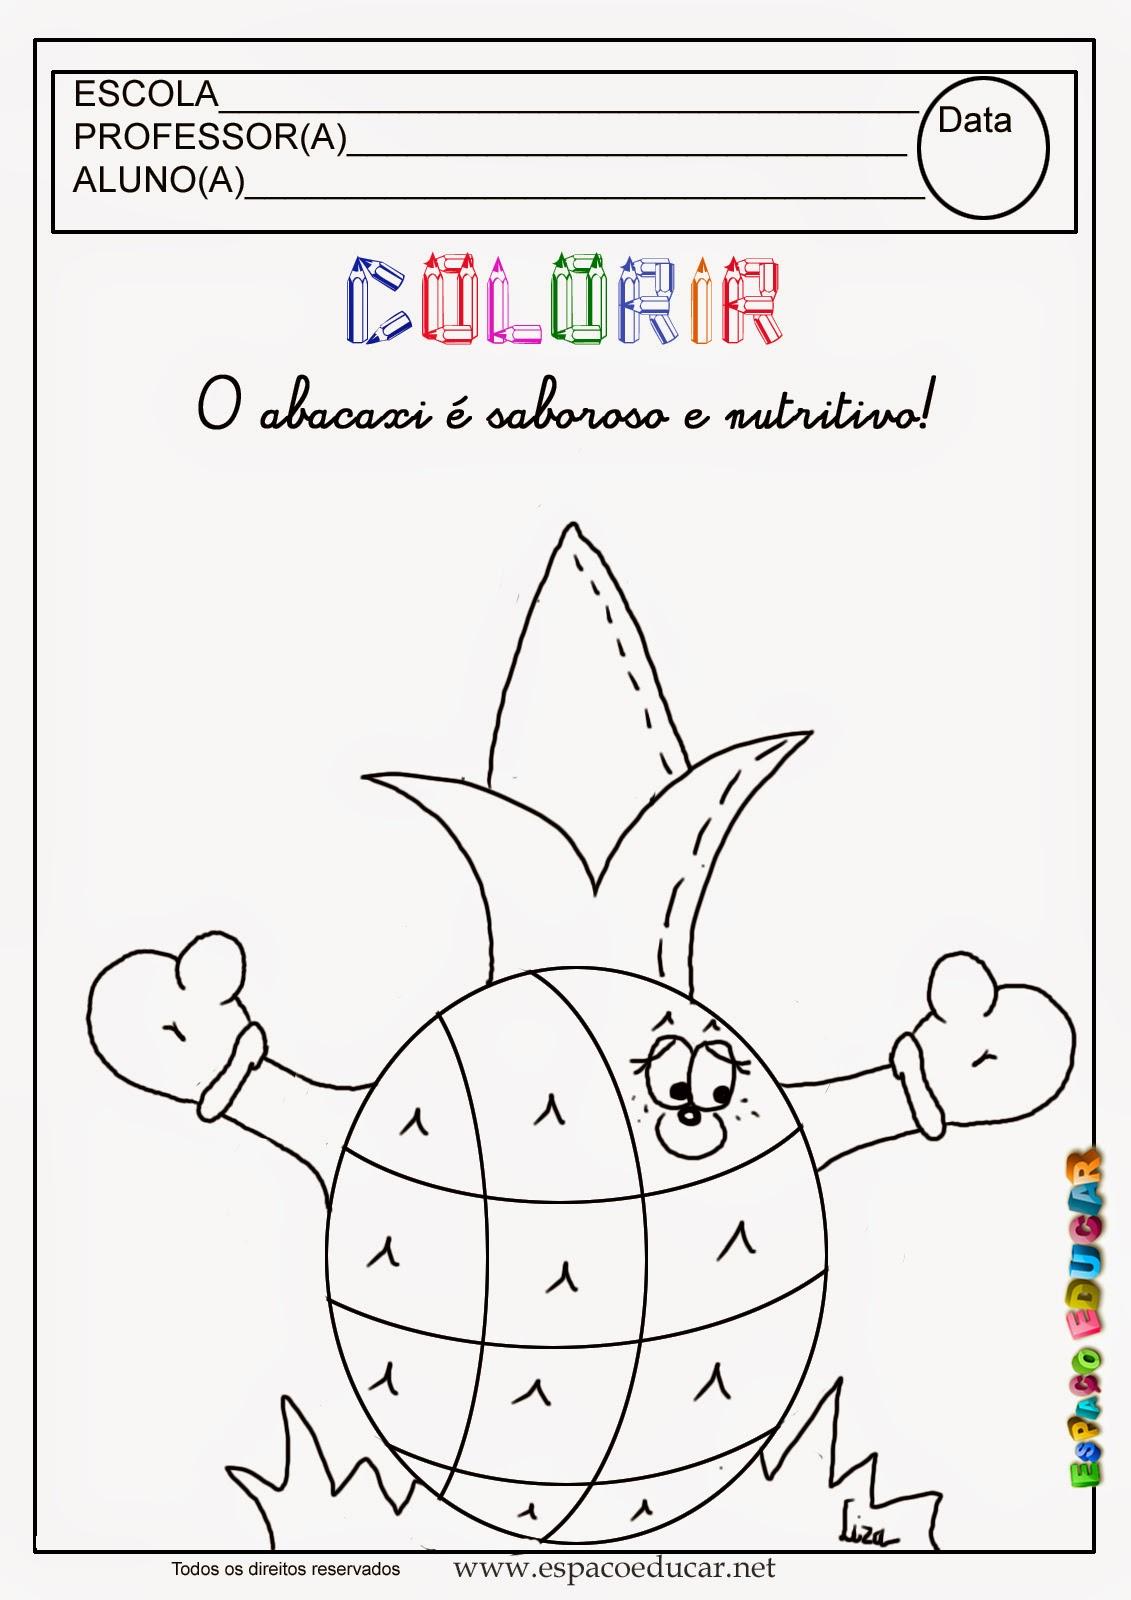 Desenho De Abacaxi Para Colorir Pintar Imprimir Espaco Pedagogico